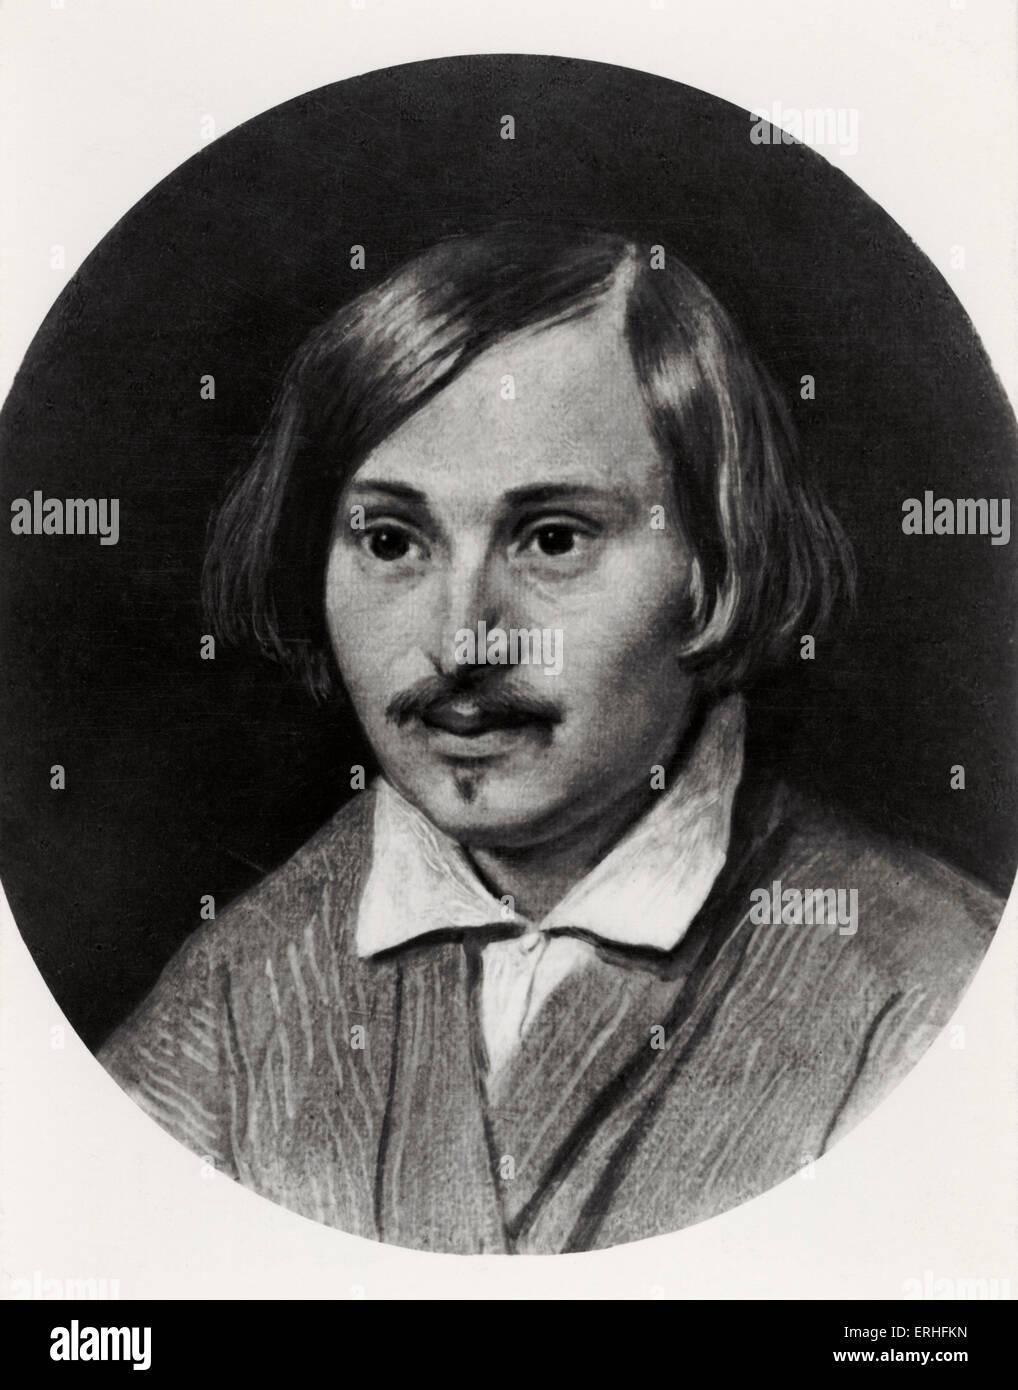 Nikolai Vassilievich Gogol - portrait by A A Ivanov. Russian novelist - 1809-1852 - Ivanov, Russian painter: 1806 - Stock Image